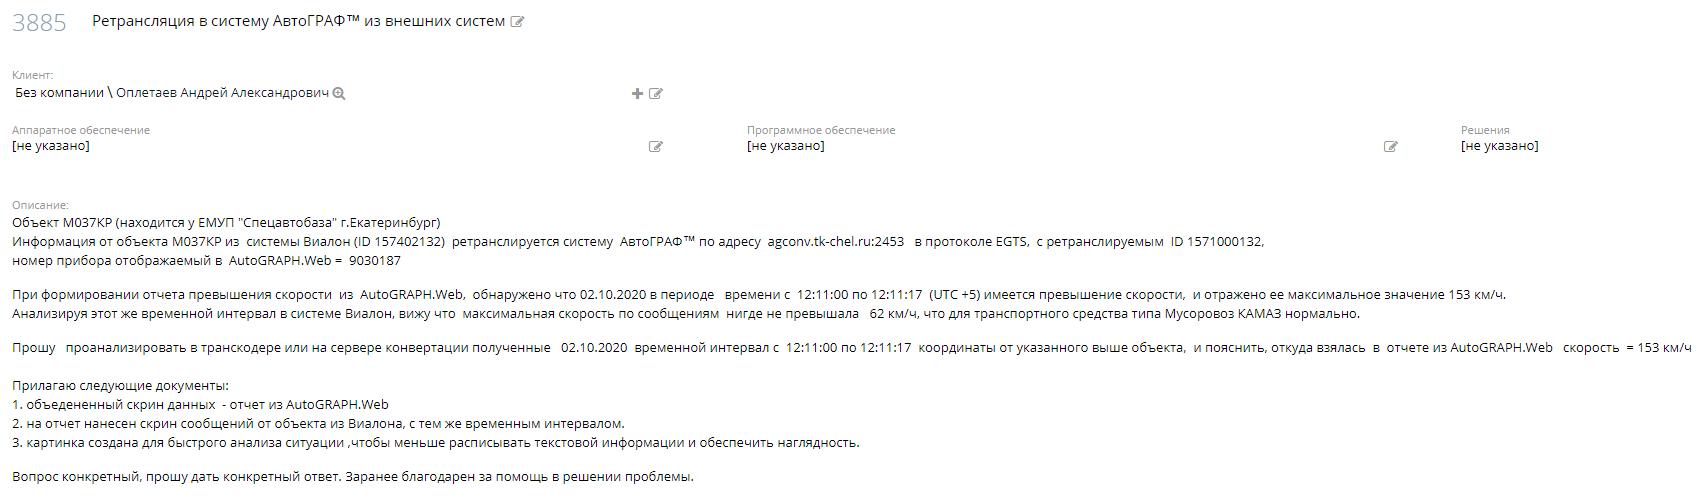 http://i.tk-chel.ru/sk/sharex/2020-10-12_14-51-03_83621.png